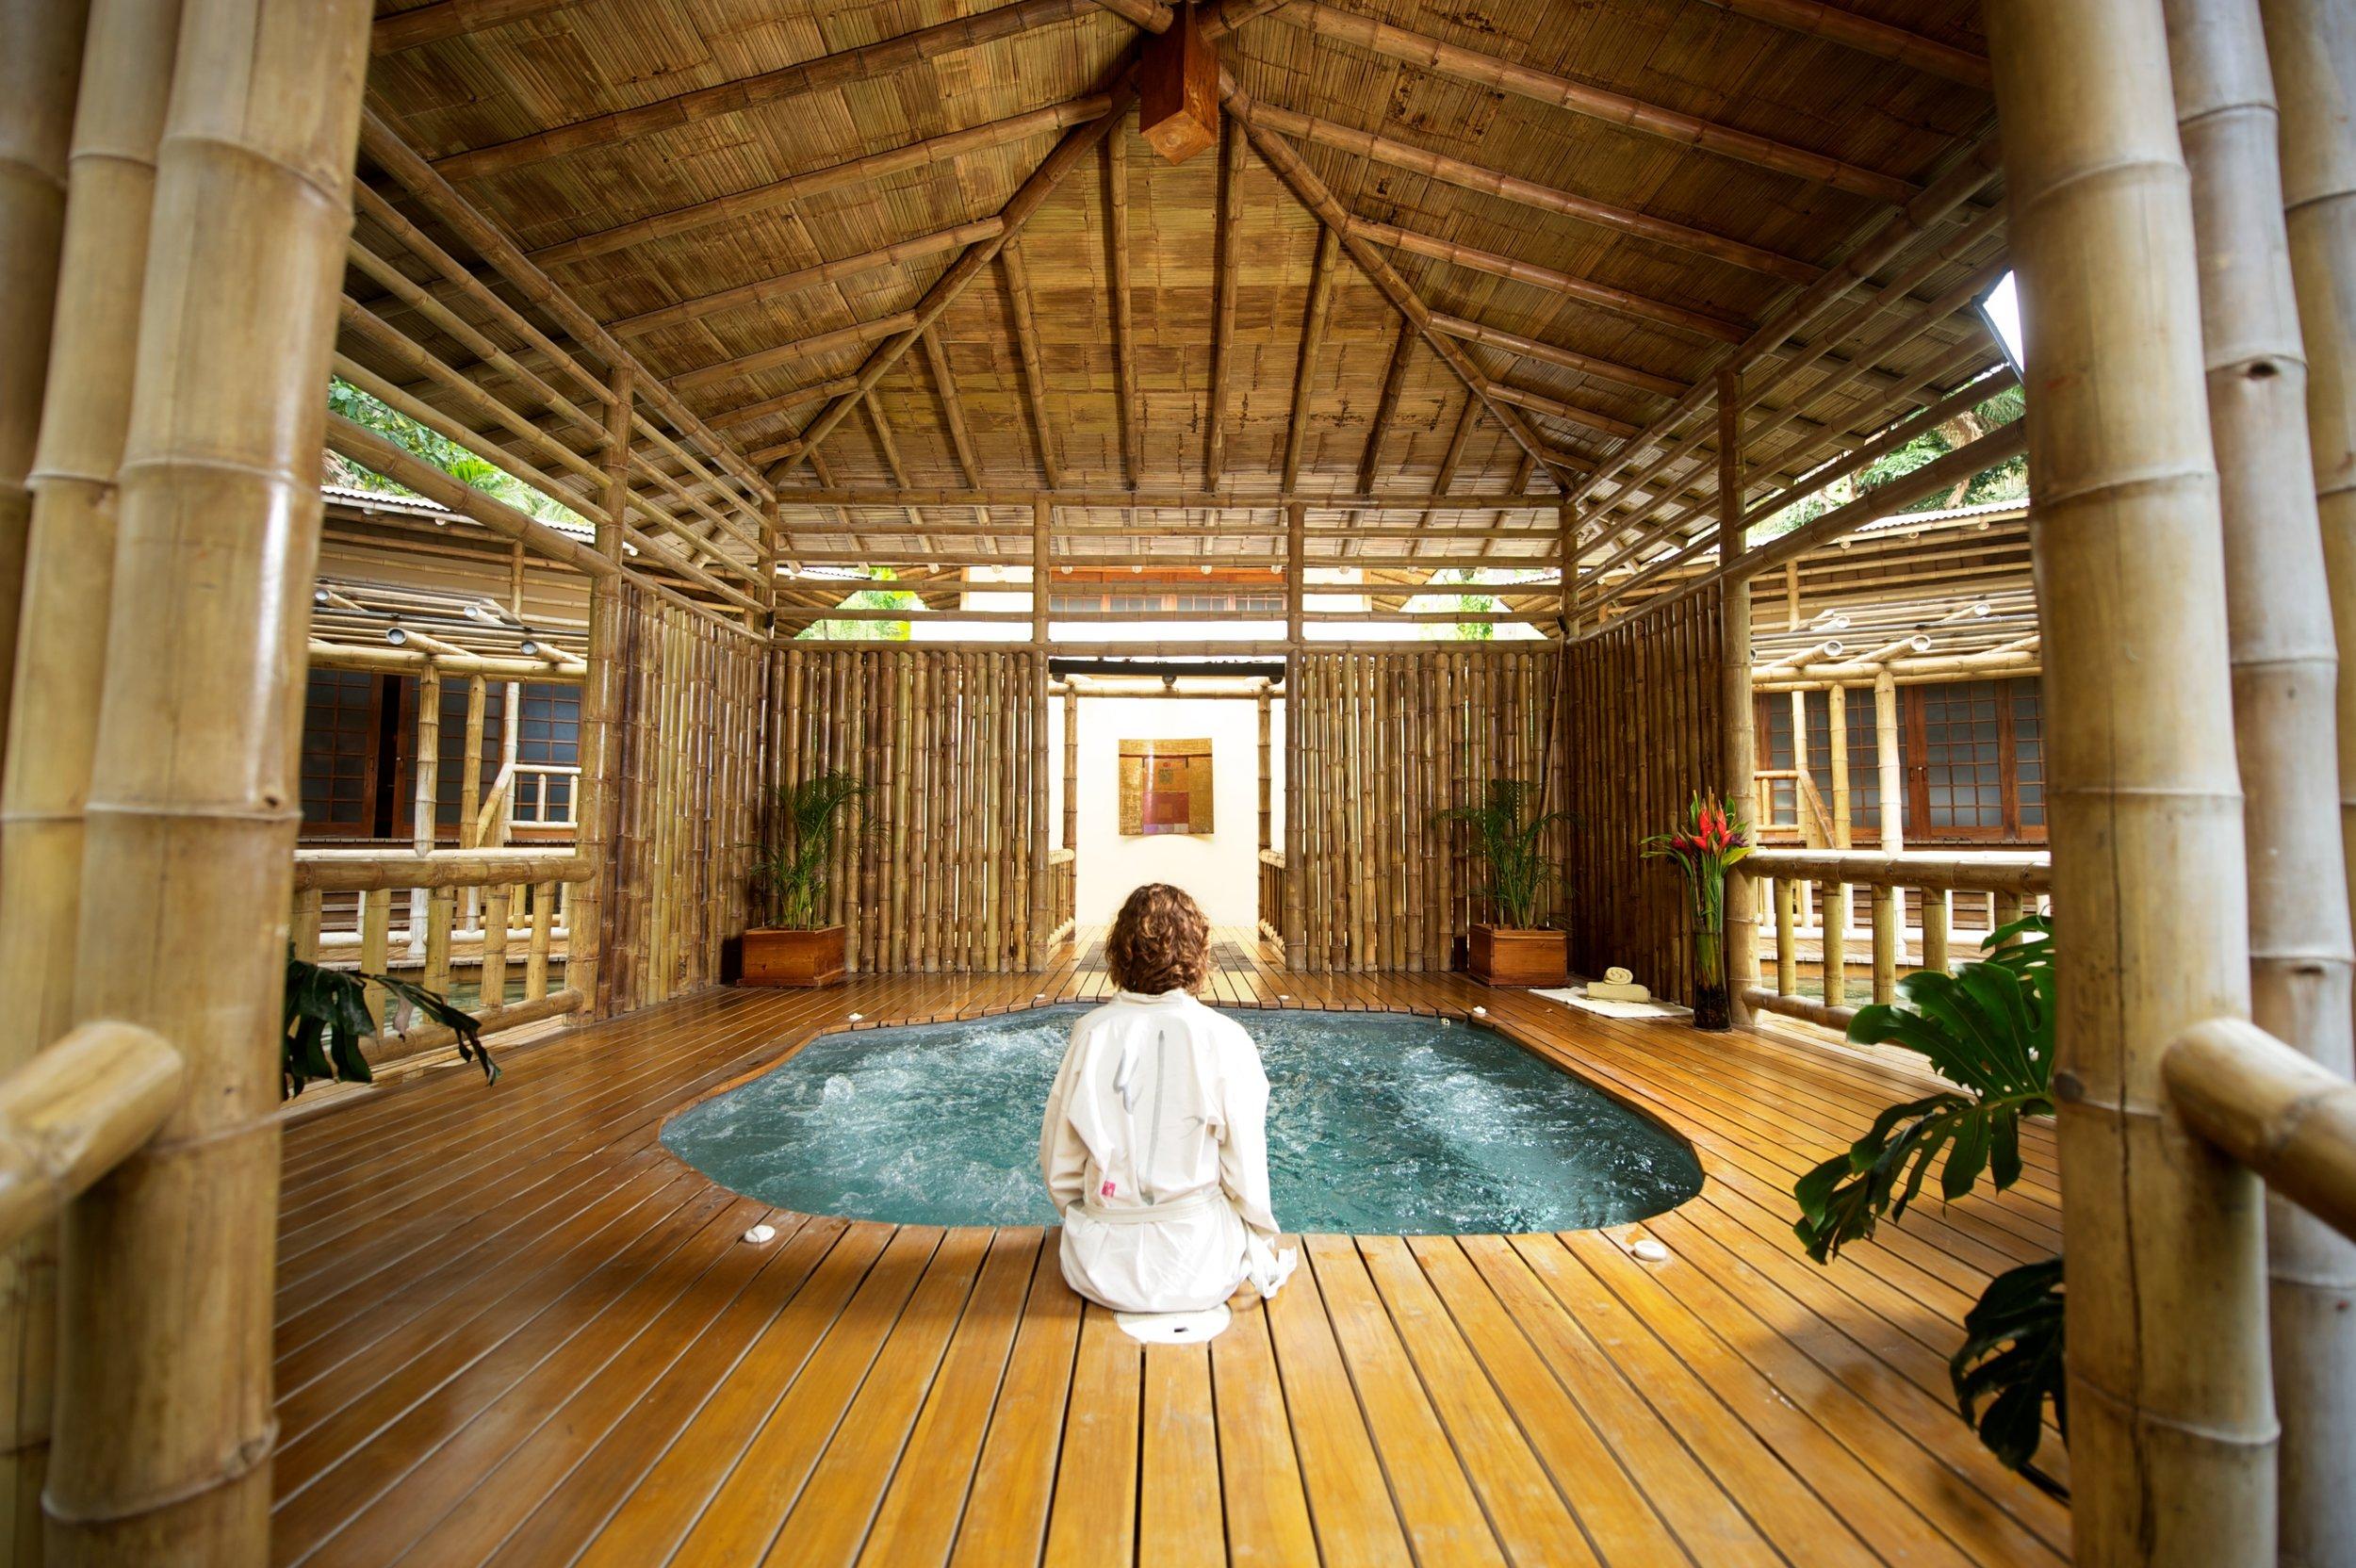 spa-bambu-relaxation-florblanca-santa-teresa (1).jpg